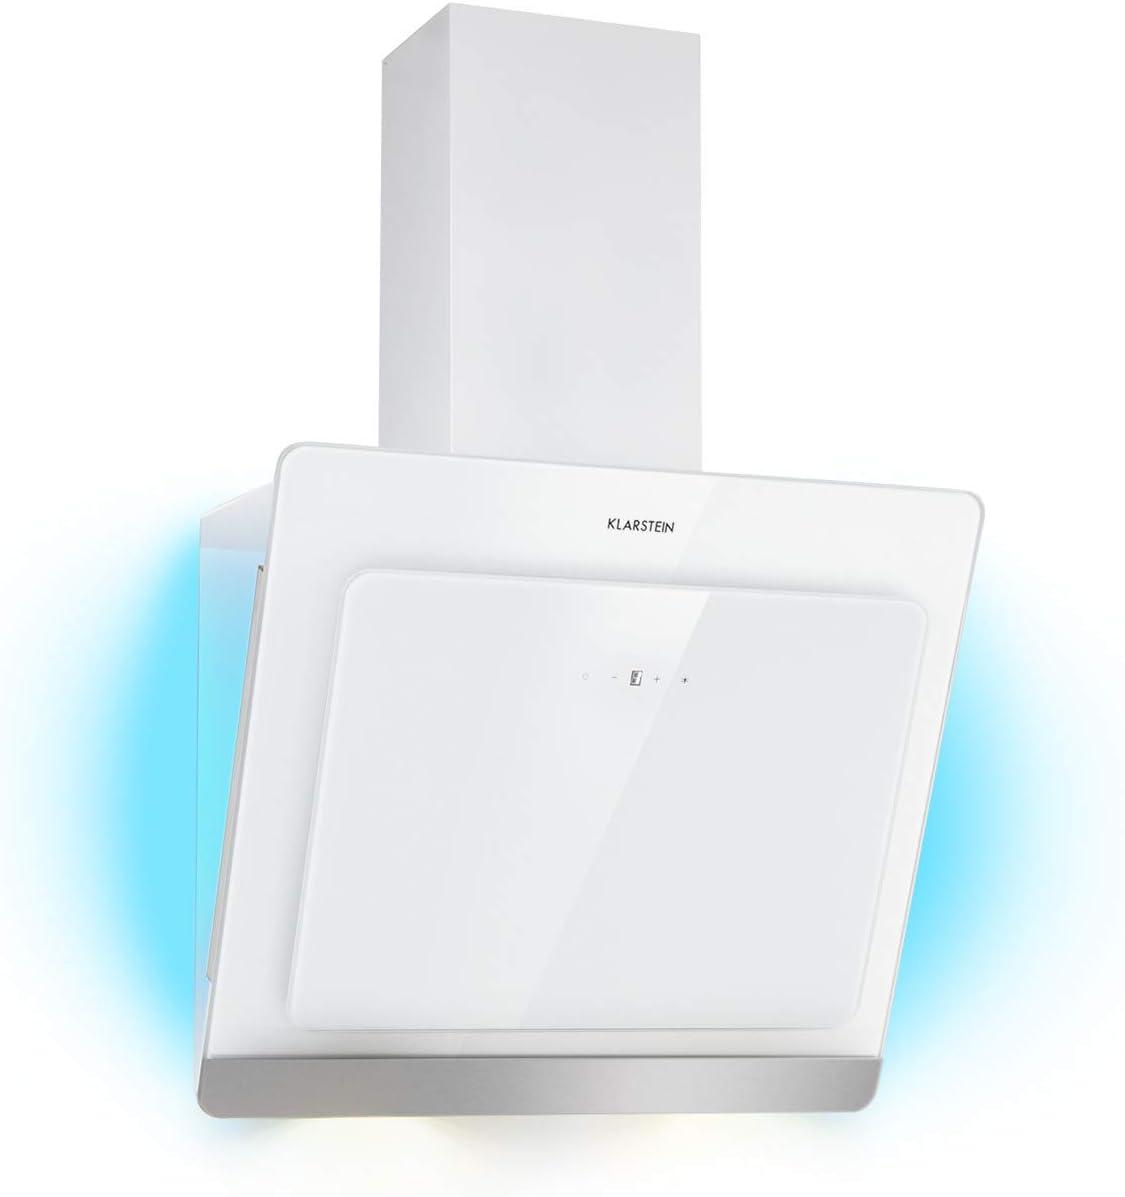 KLARSTEIN Aurora Eco 60 - Campana extractora, 550 m³/h, Bajo Consumo, Eco Excellence, Display LED, Balanced Light Concept, 3 Niveles, Diseño Compacto, Clase fluidodinámica A, Blanco